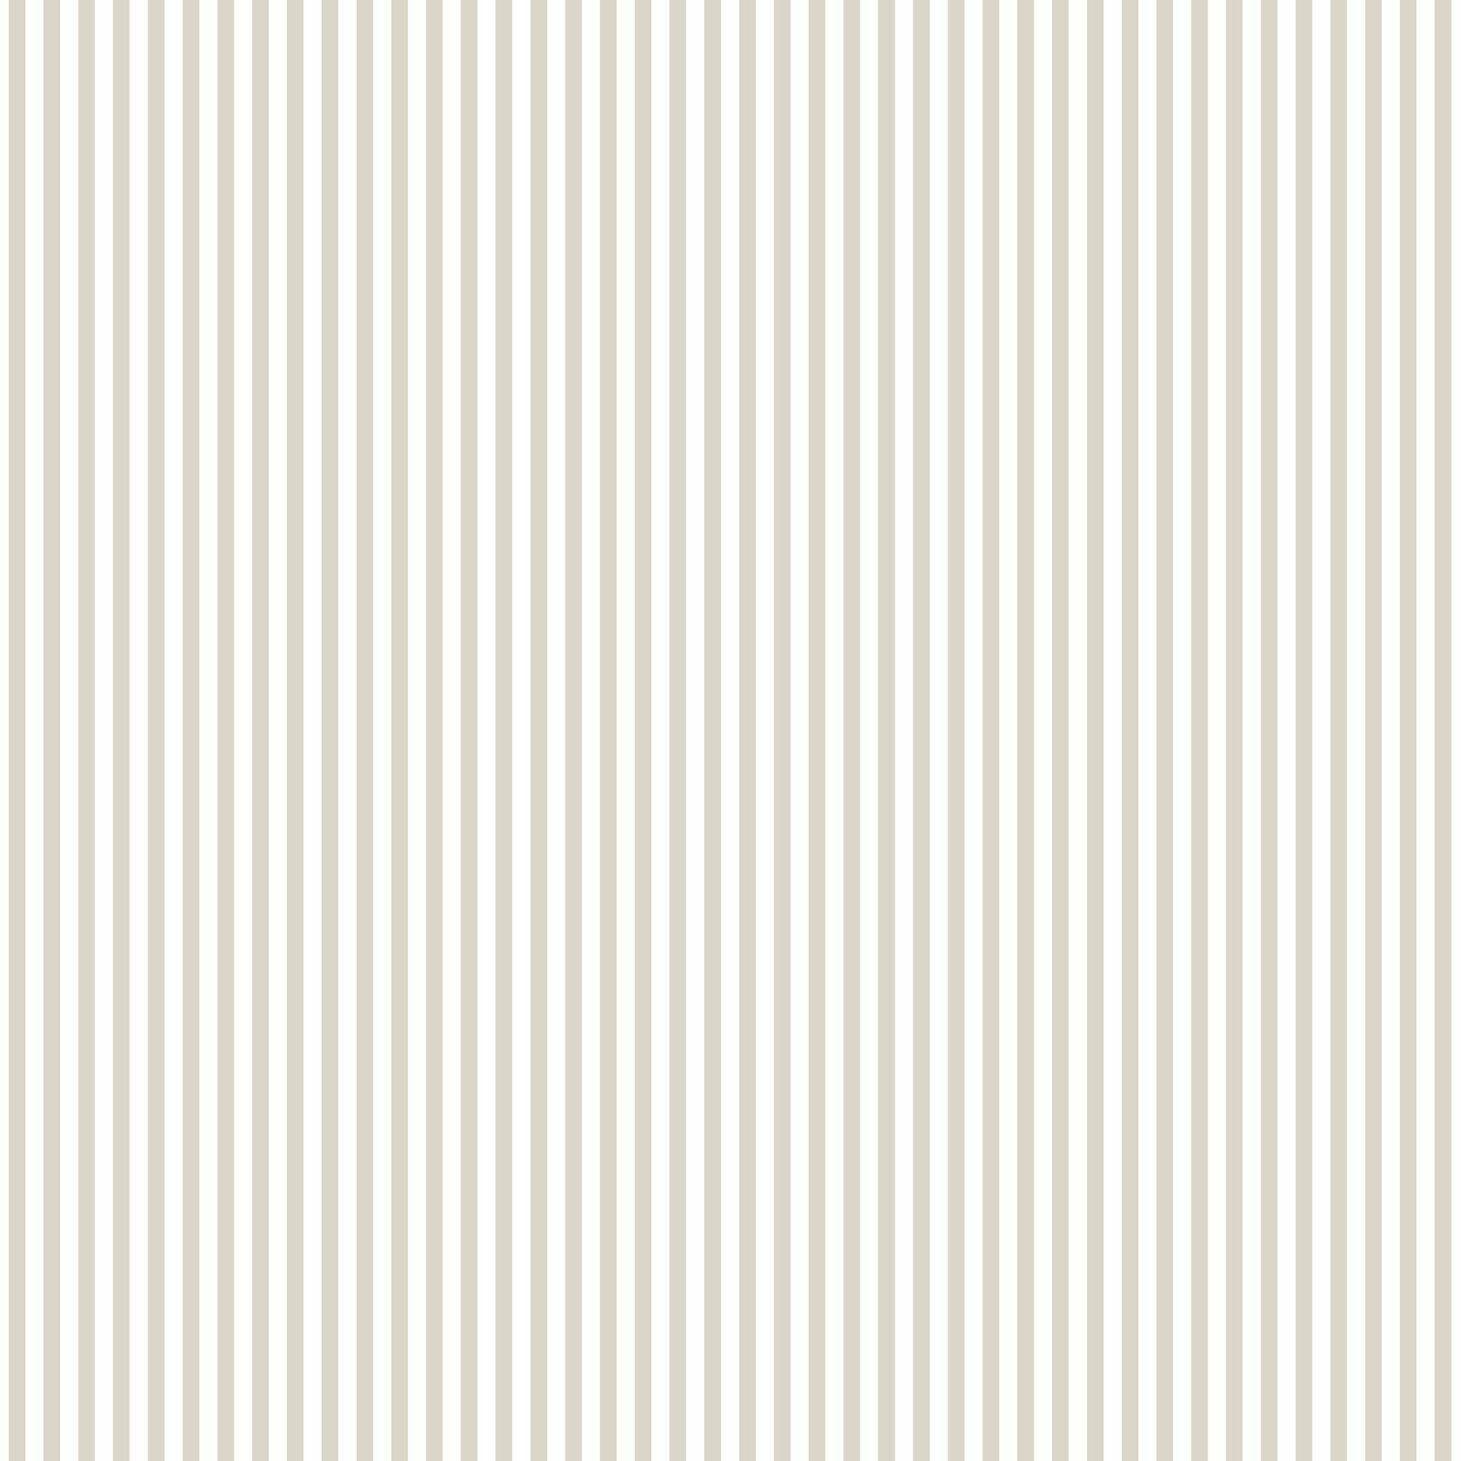 Essener Tapete Simply Stripes 3 St36905 Beige Stripes Striped Vinyl Wallpaper